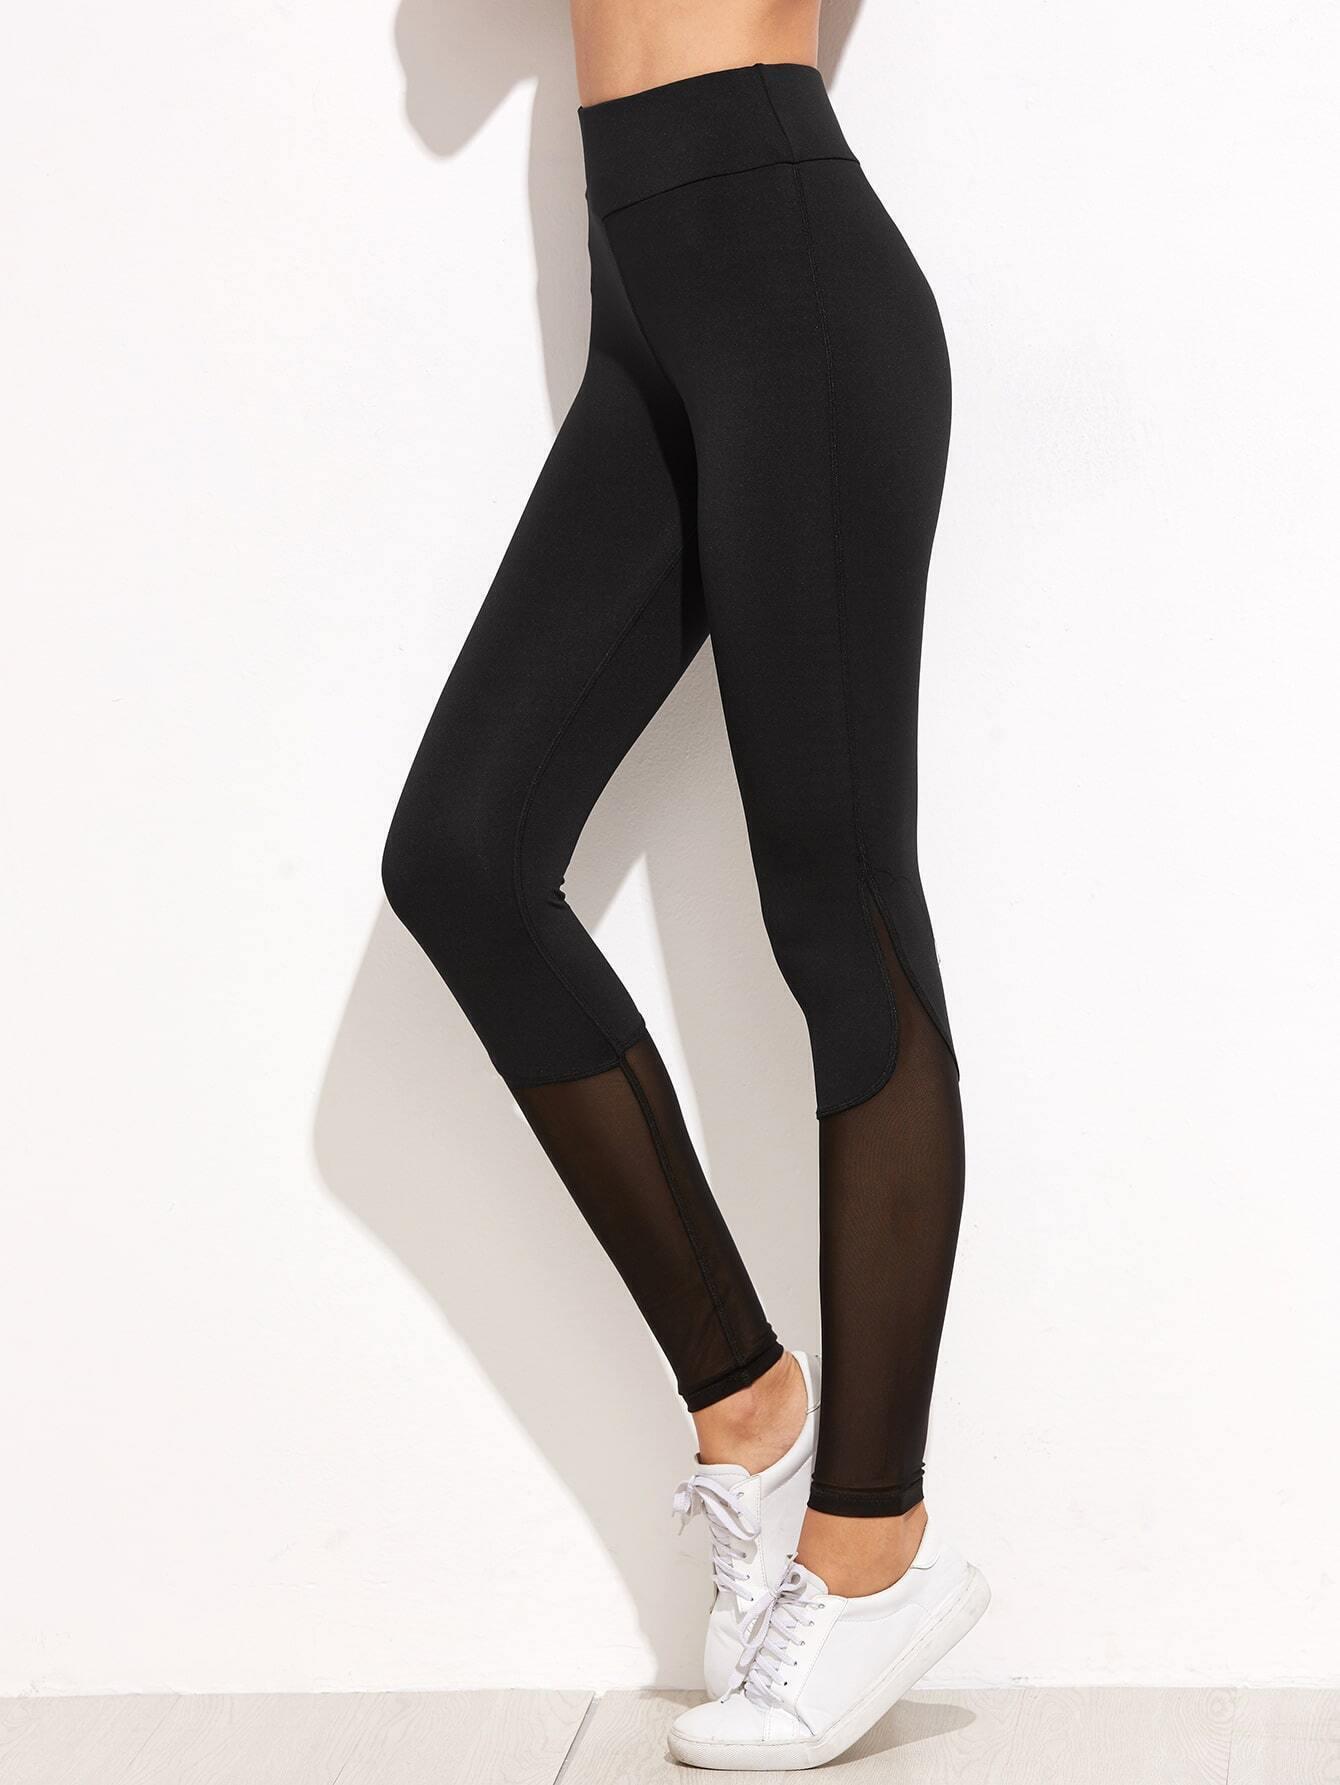 033ff0e74985e5 Black Contrast Mesh Leggings EmmaCloth-Women Fast Fashion Online